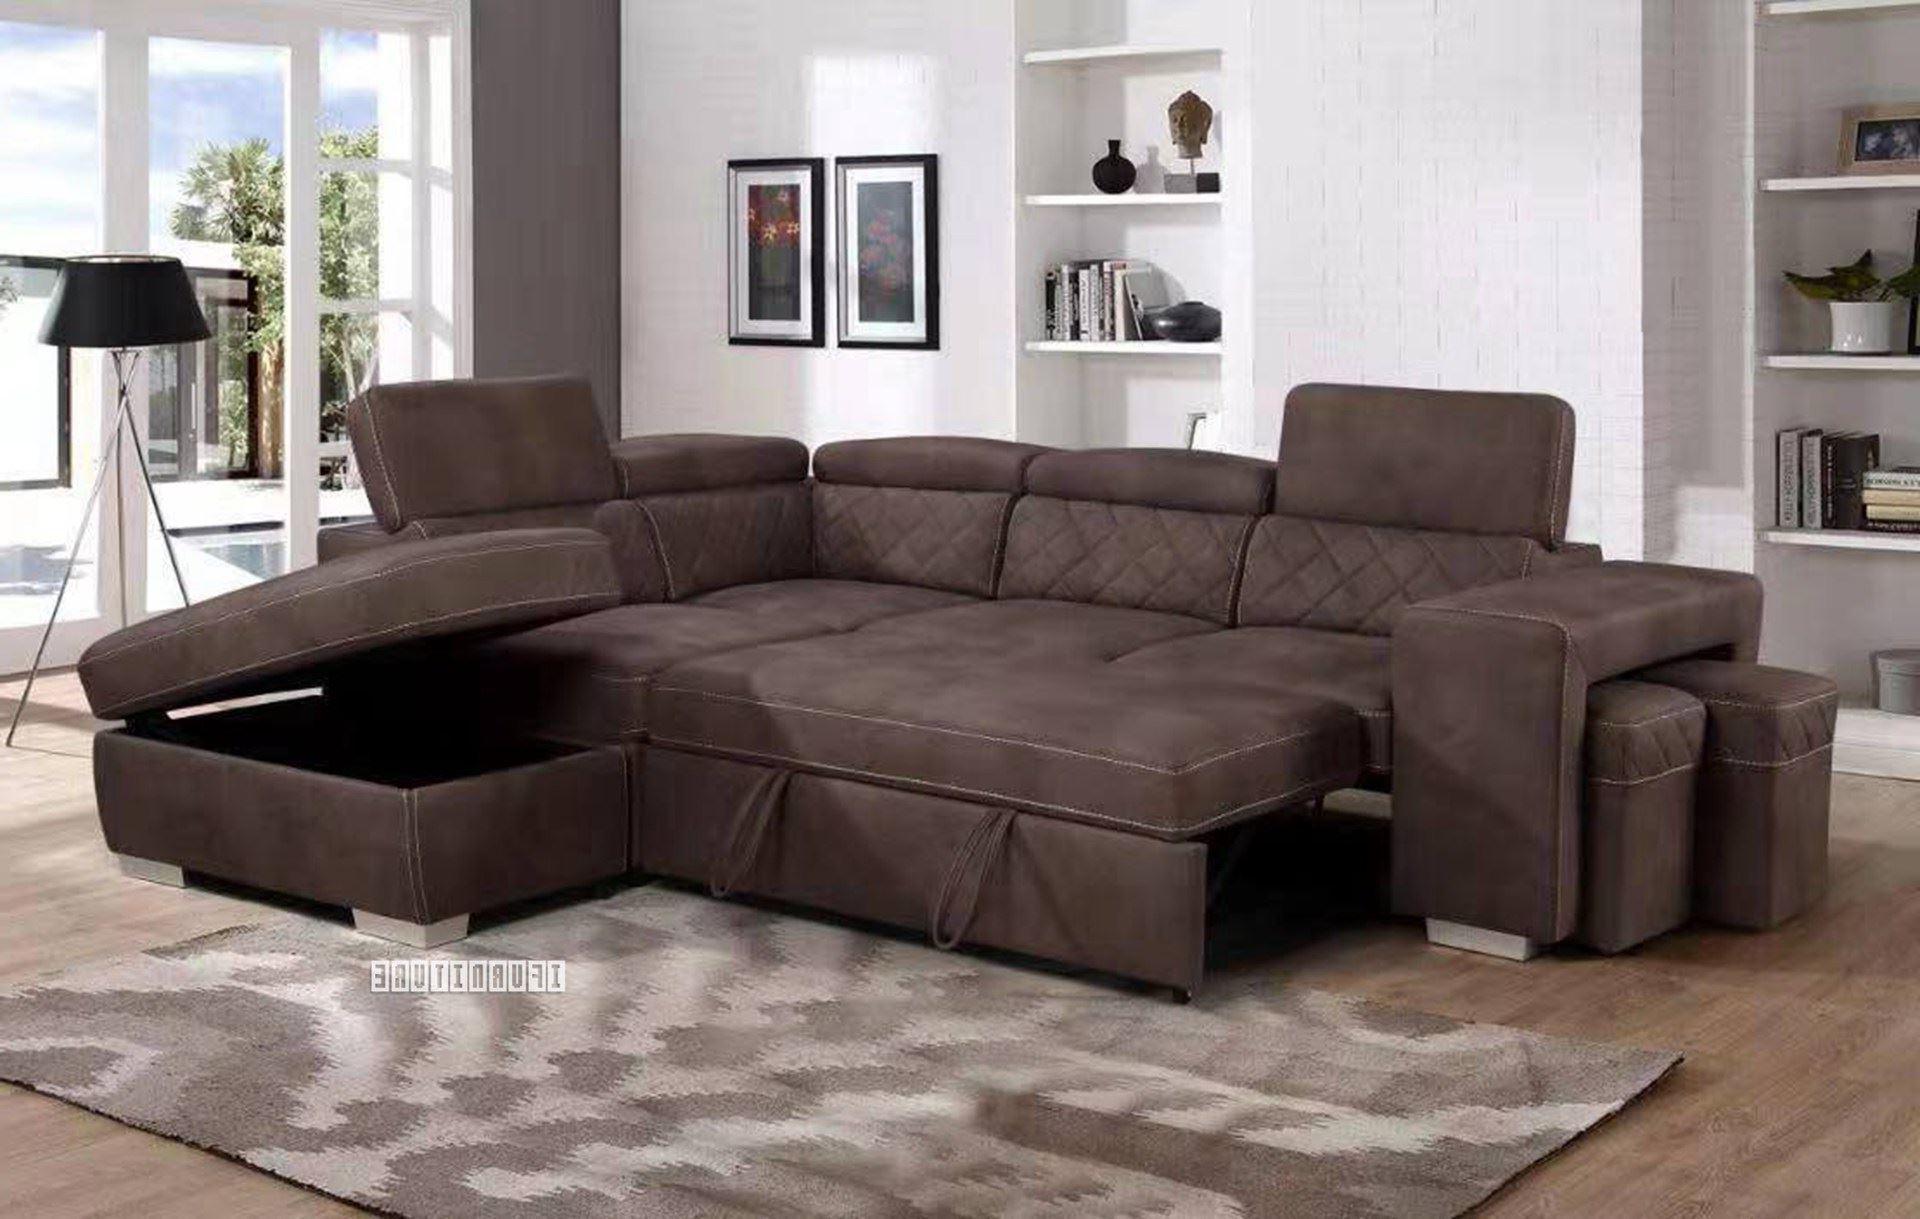 Hartford Storage Sectional Futon Sofas Regarding Preferred Aria Sectional Sofa/ Sofa Bed With Storage & 2 Ottomans (View 16 of 20)